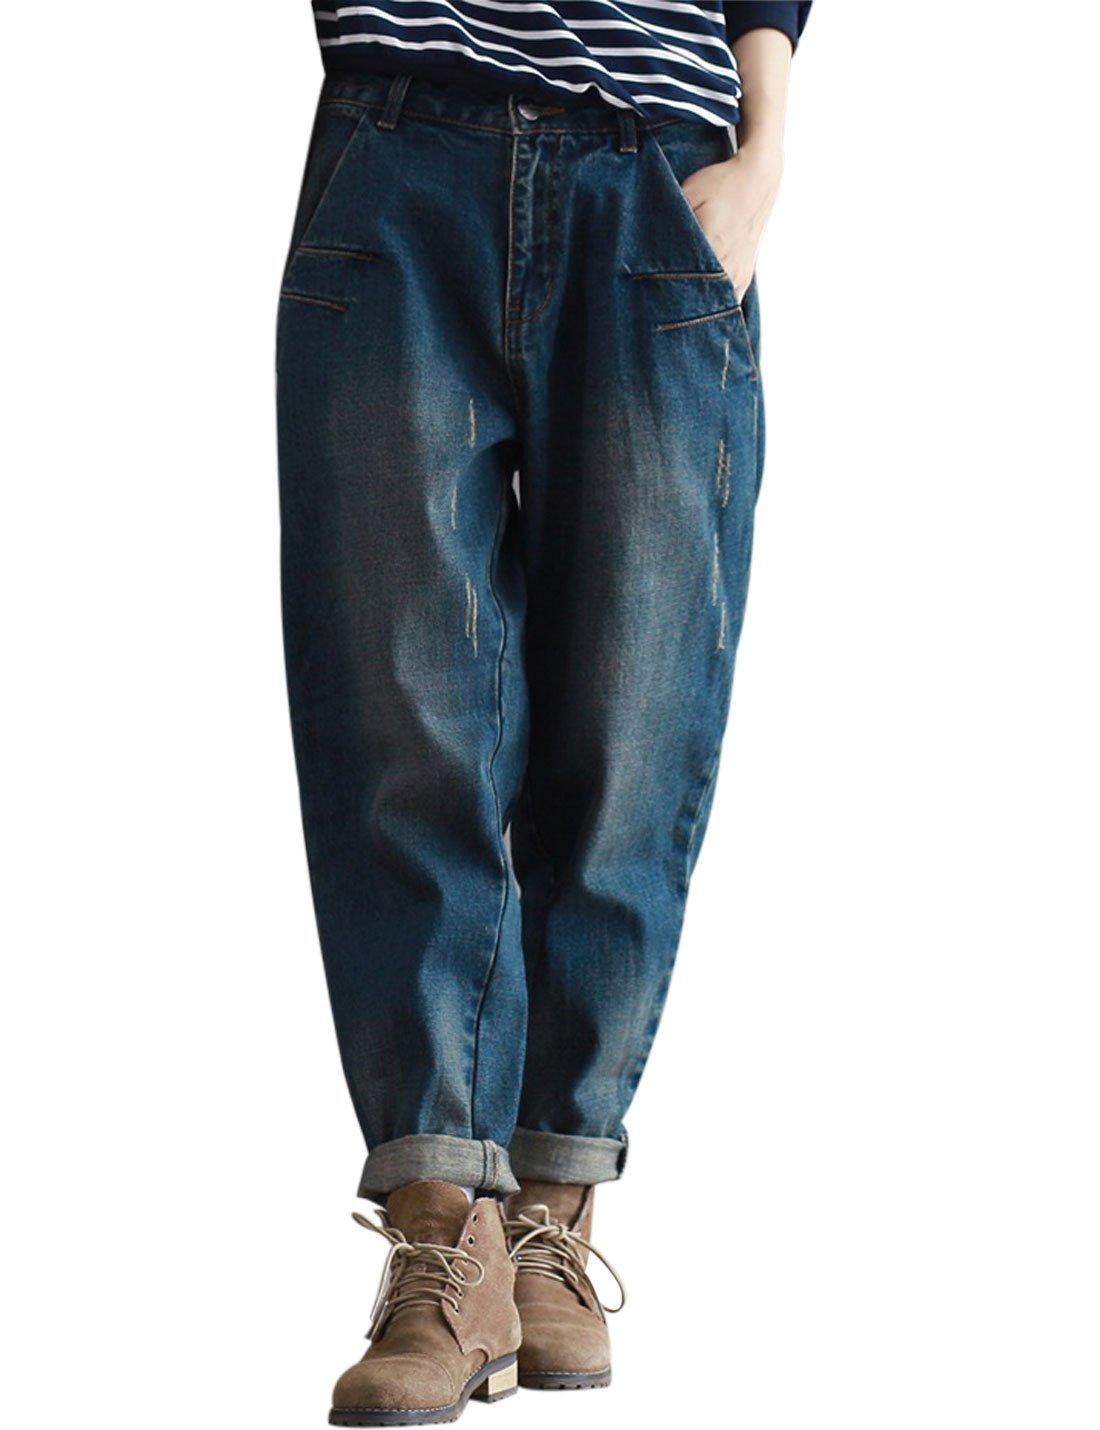 Yeokou Women's Casual Loose Distressed Baggy Harem Denim Jeans Cropped Pants (Large, Dark Blue) by Yeokou (Image #7)